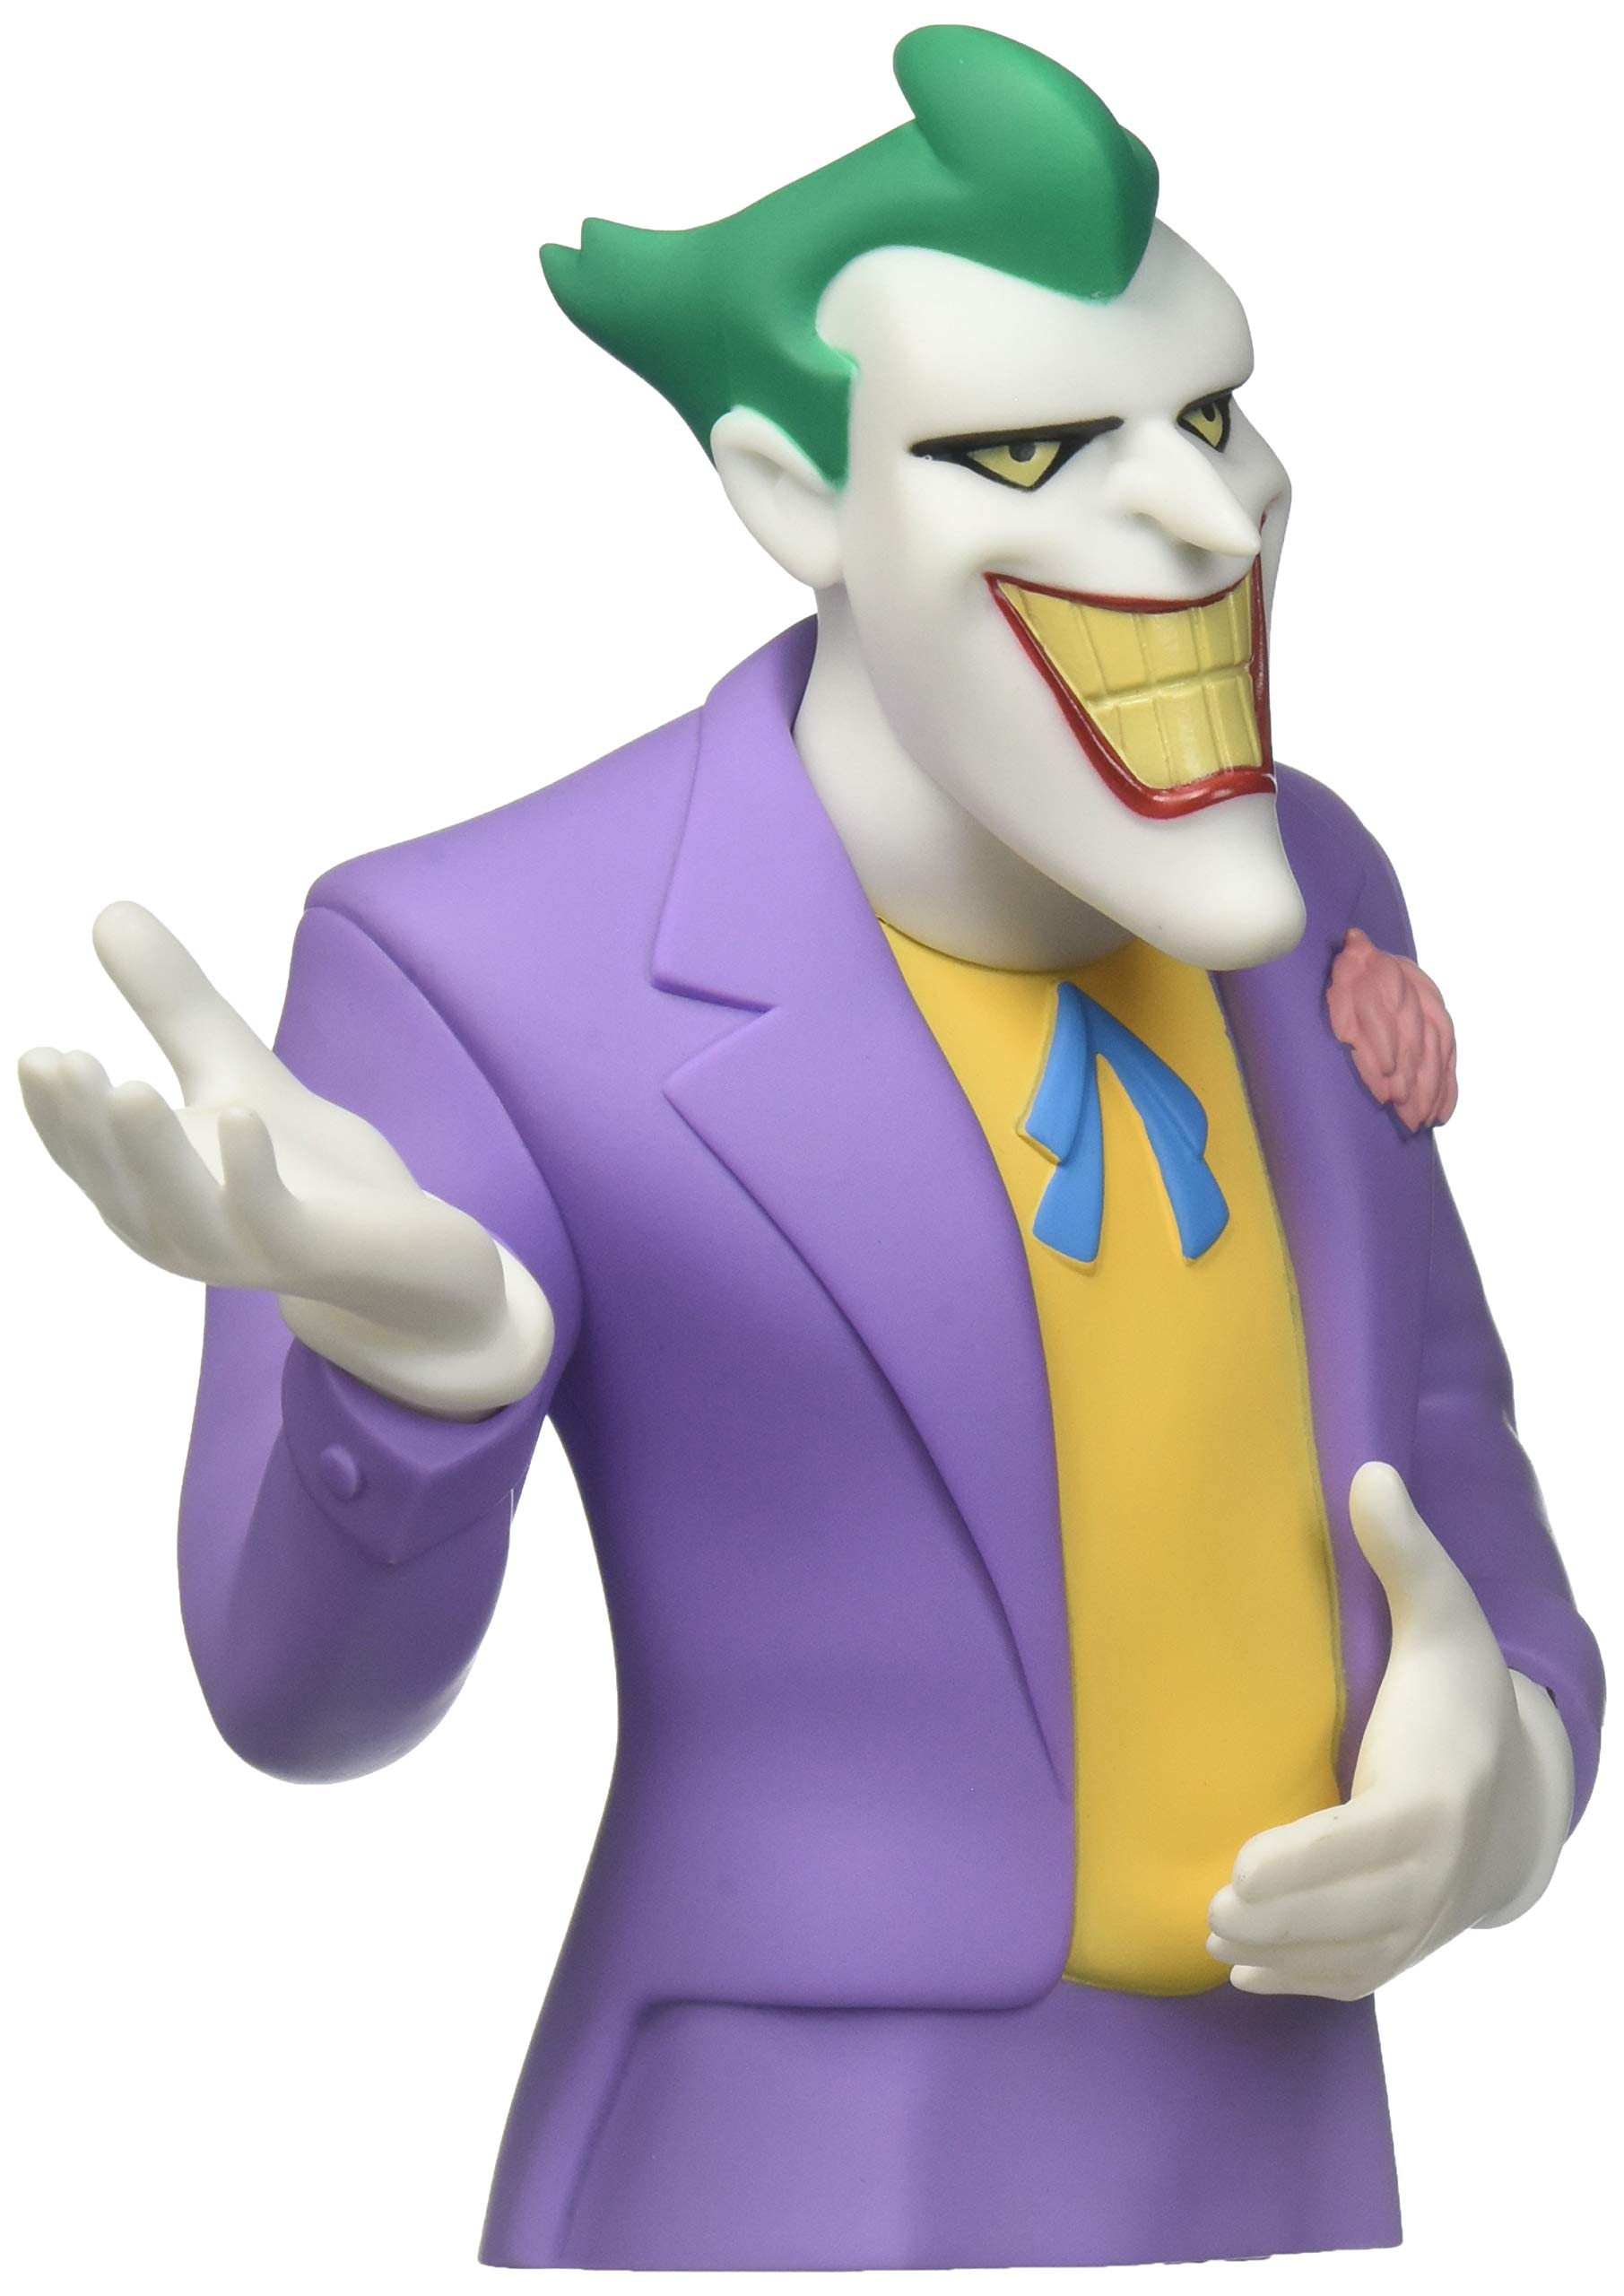 Batman Animated Series Joker Bust Bank: Diamond Select: 9781605846941:  Amazon.com: Books